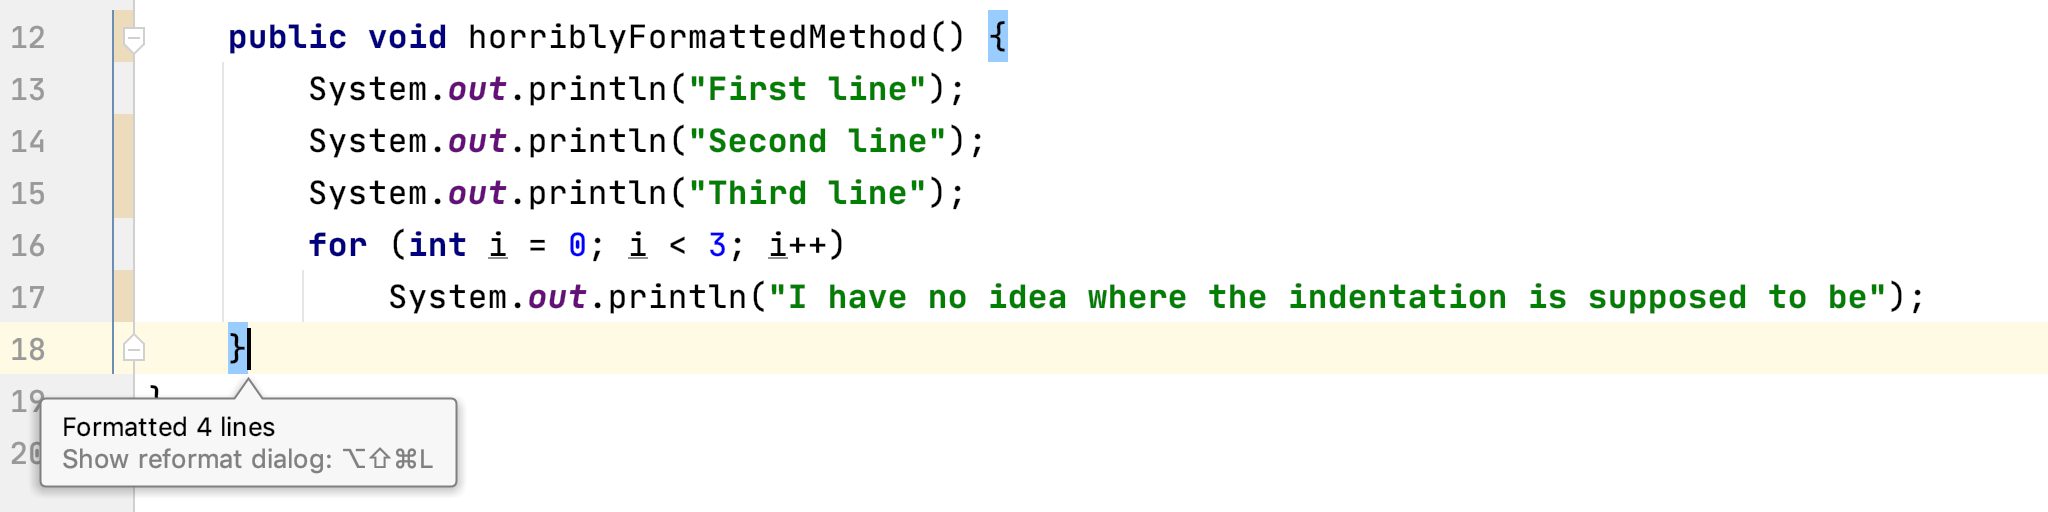 Screenshot of code after formatting